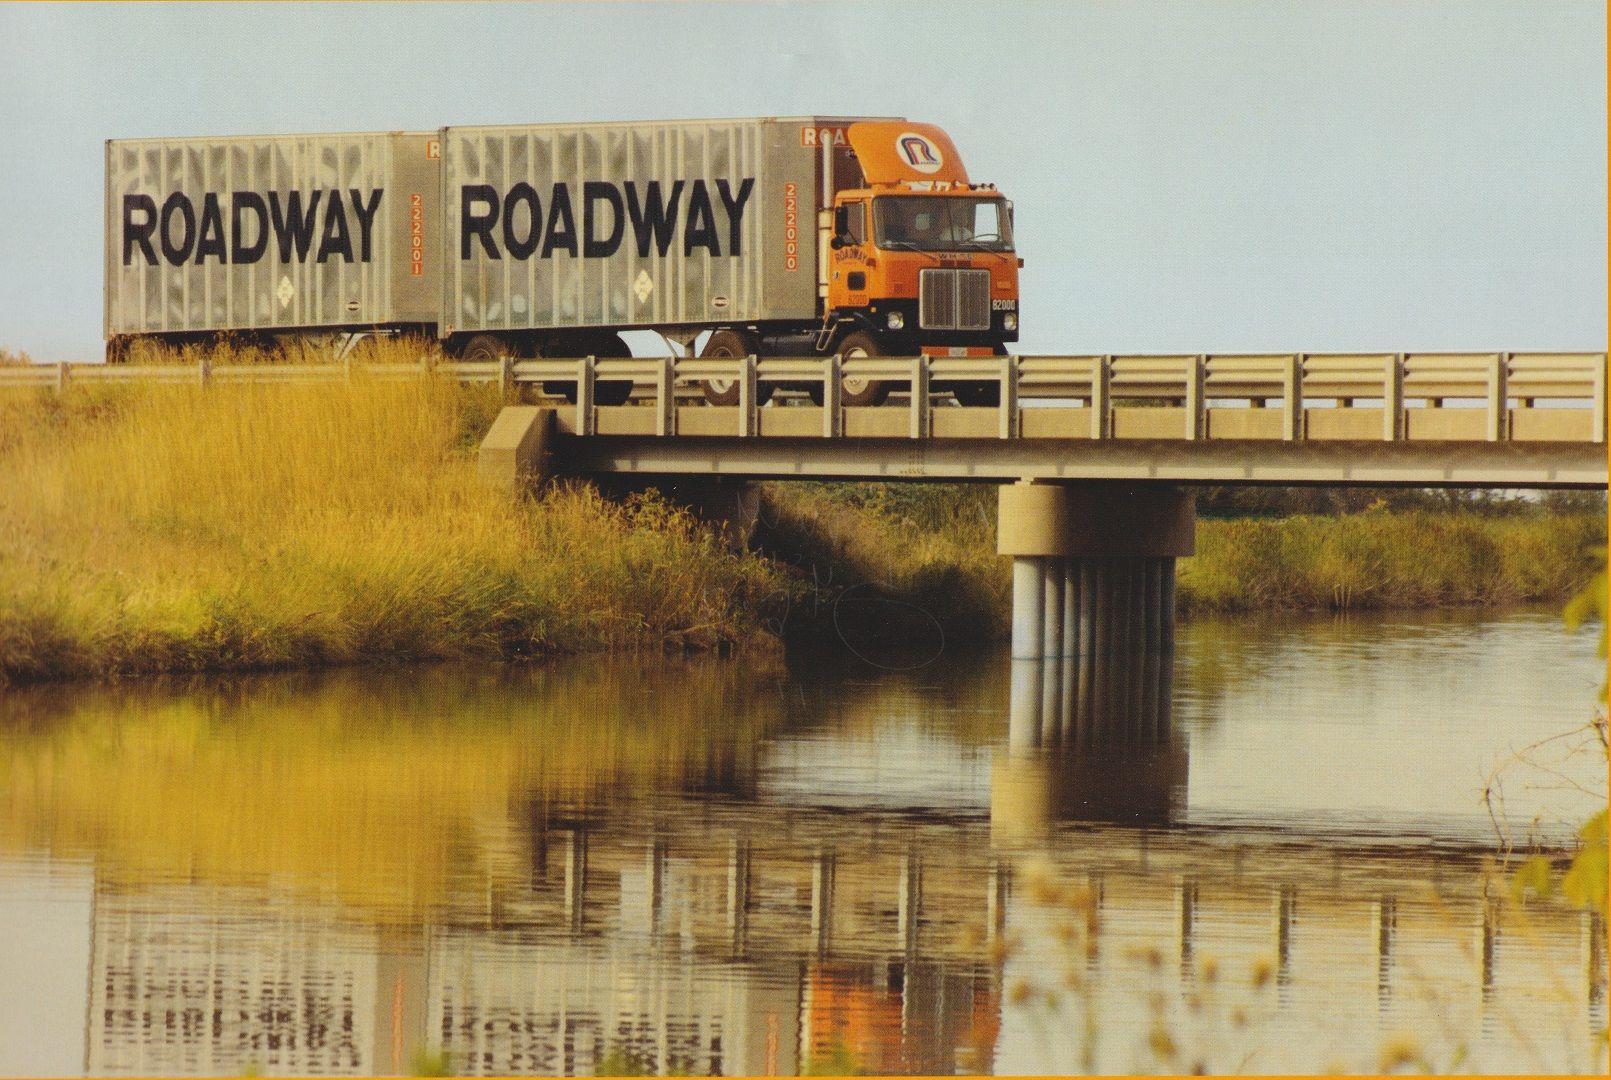 Roadway express 1968